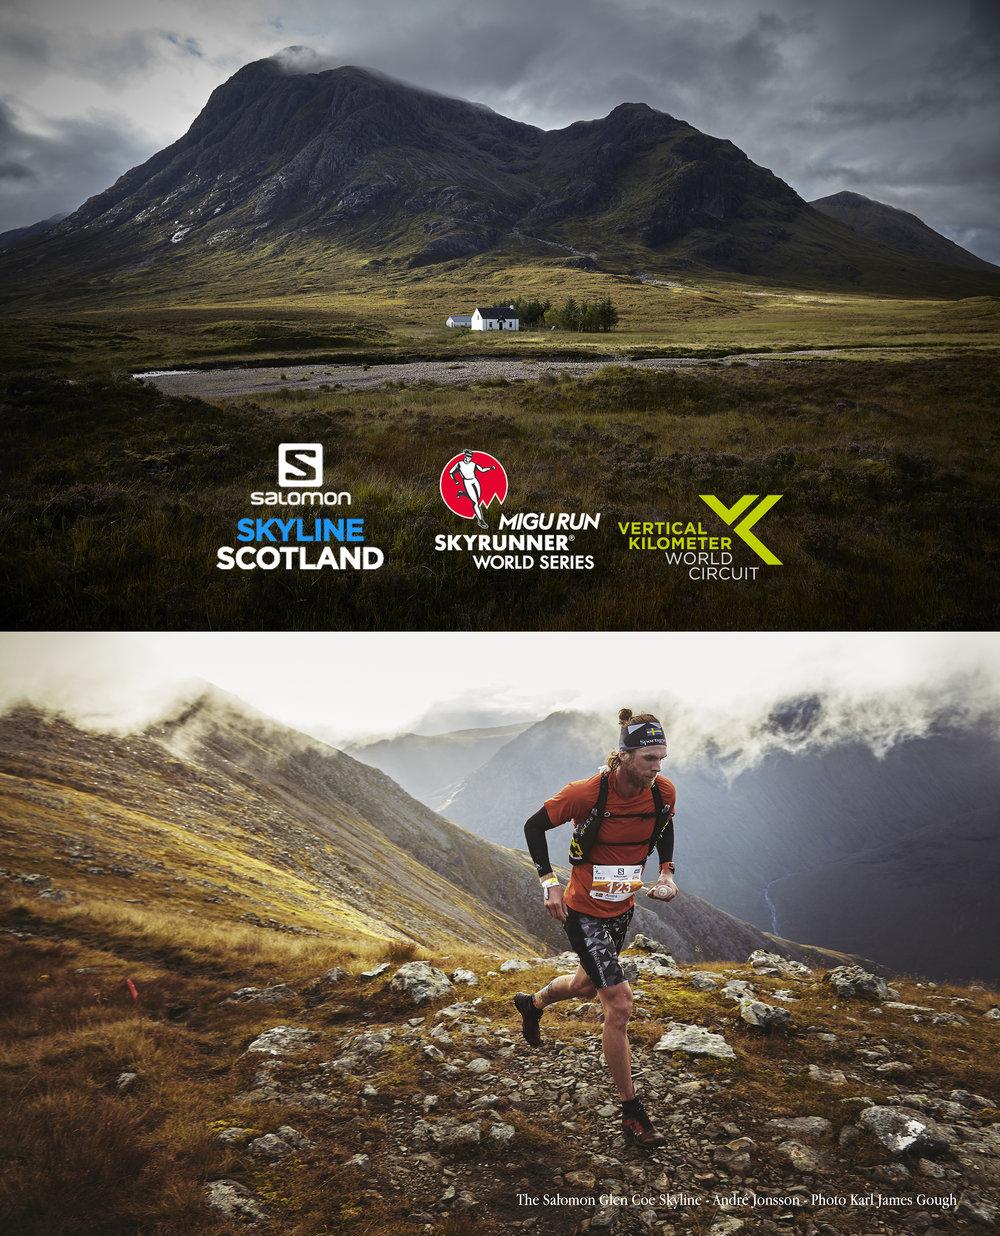 skyrunning glencoe scotland